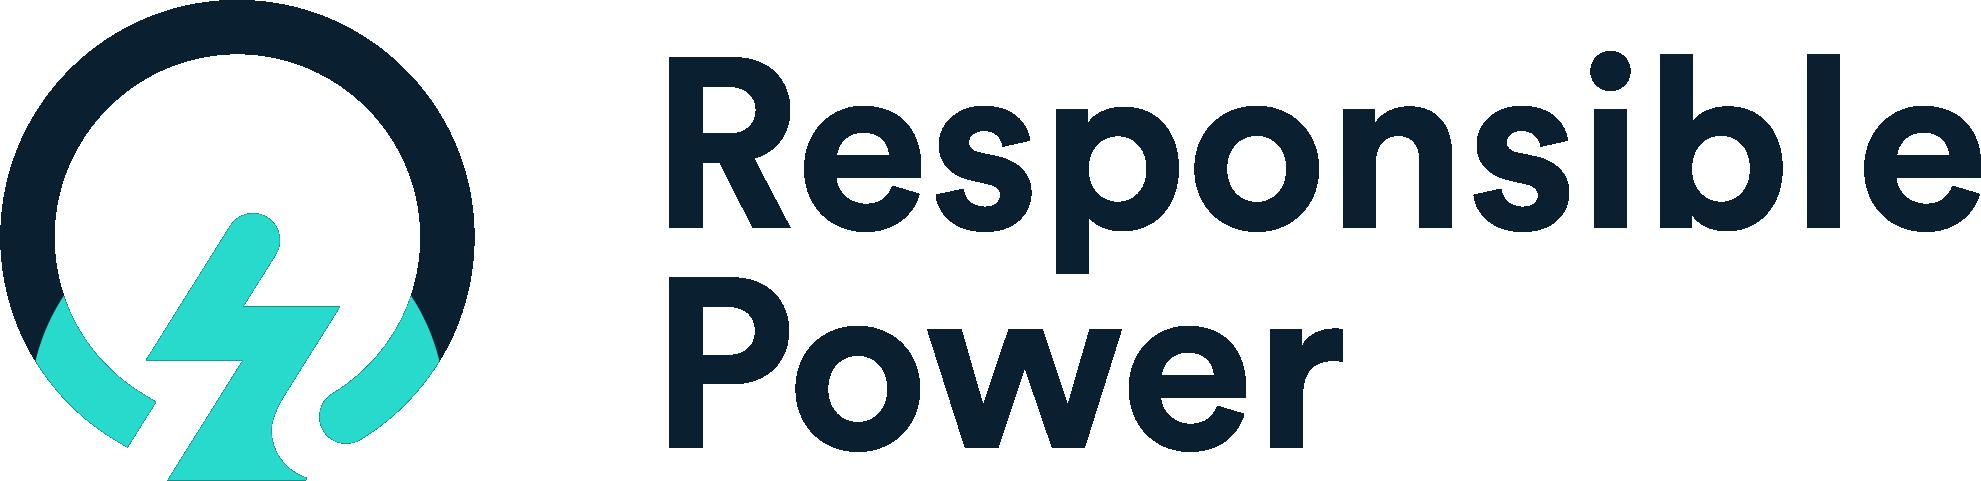 Responsible Power